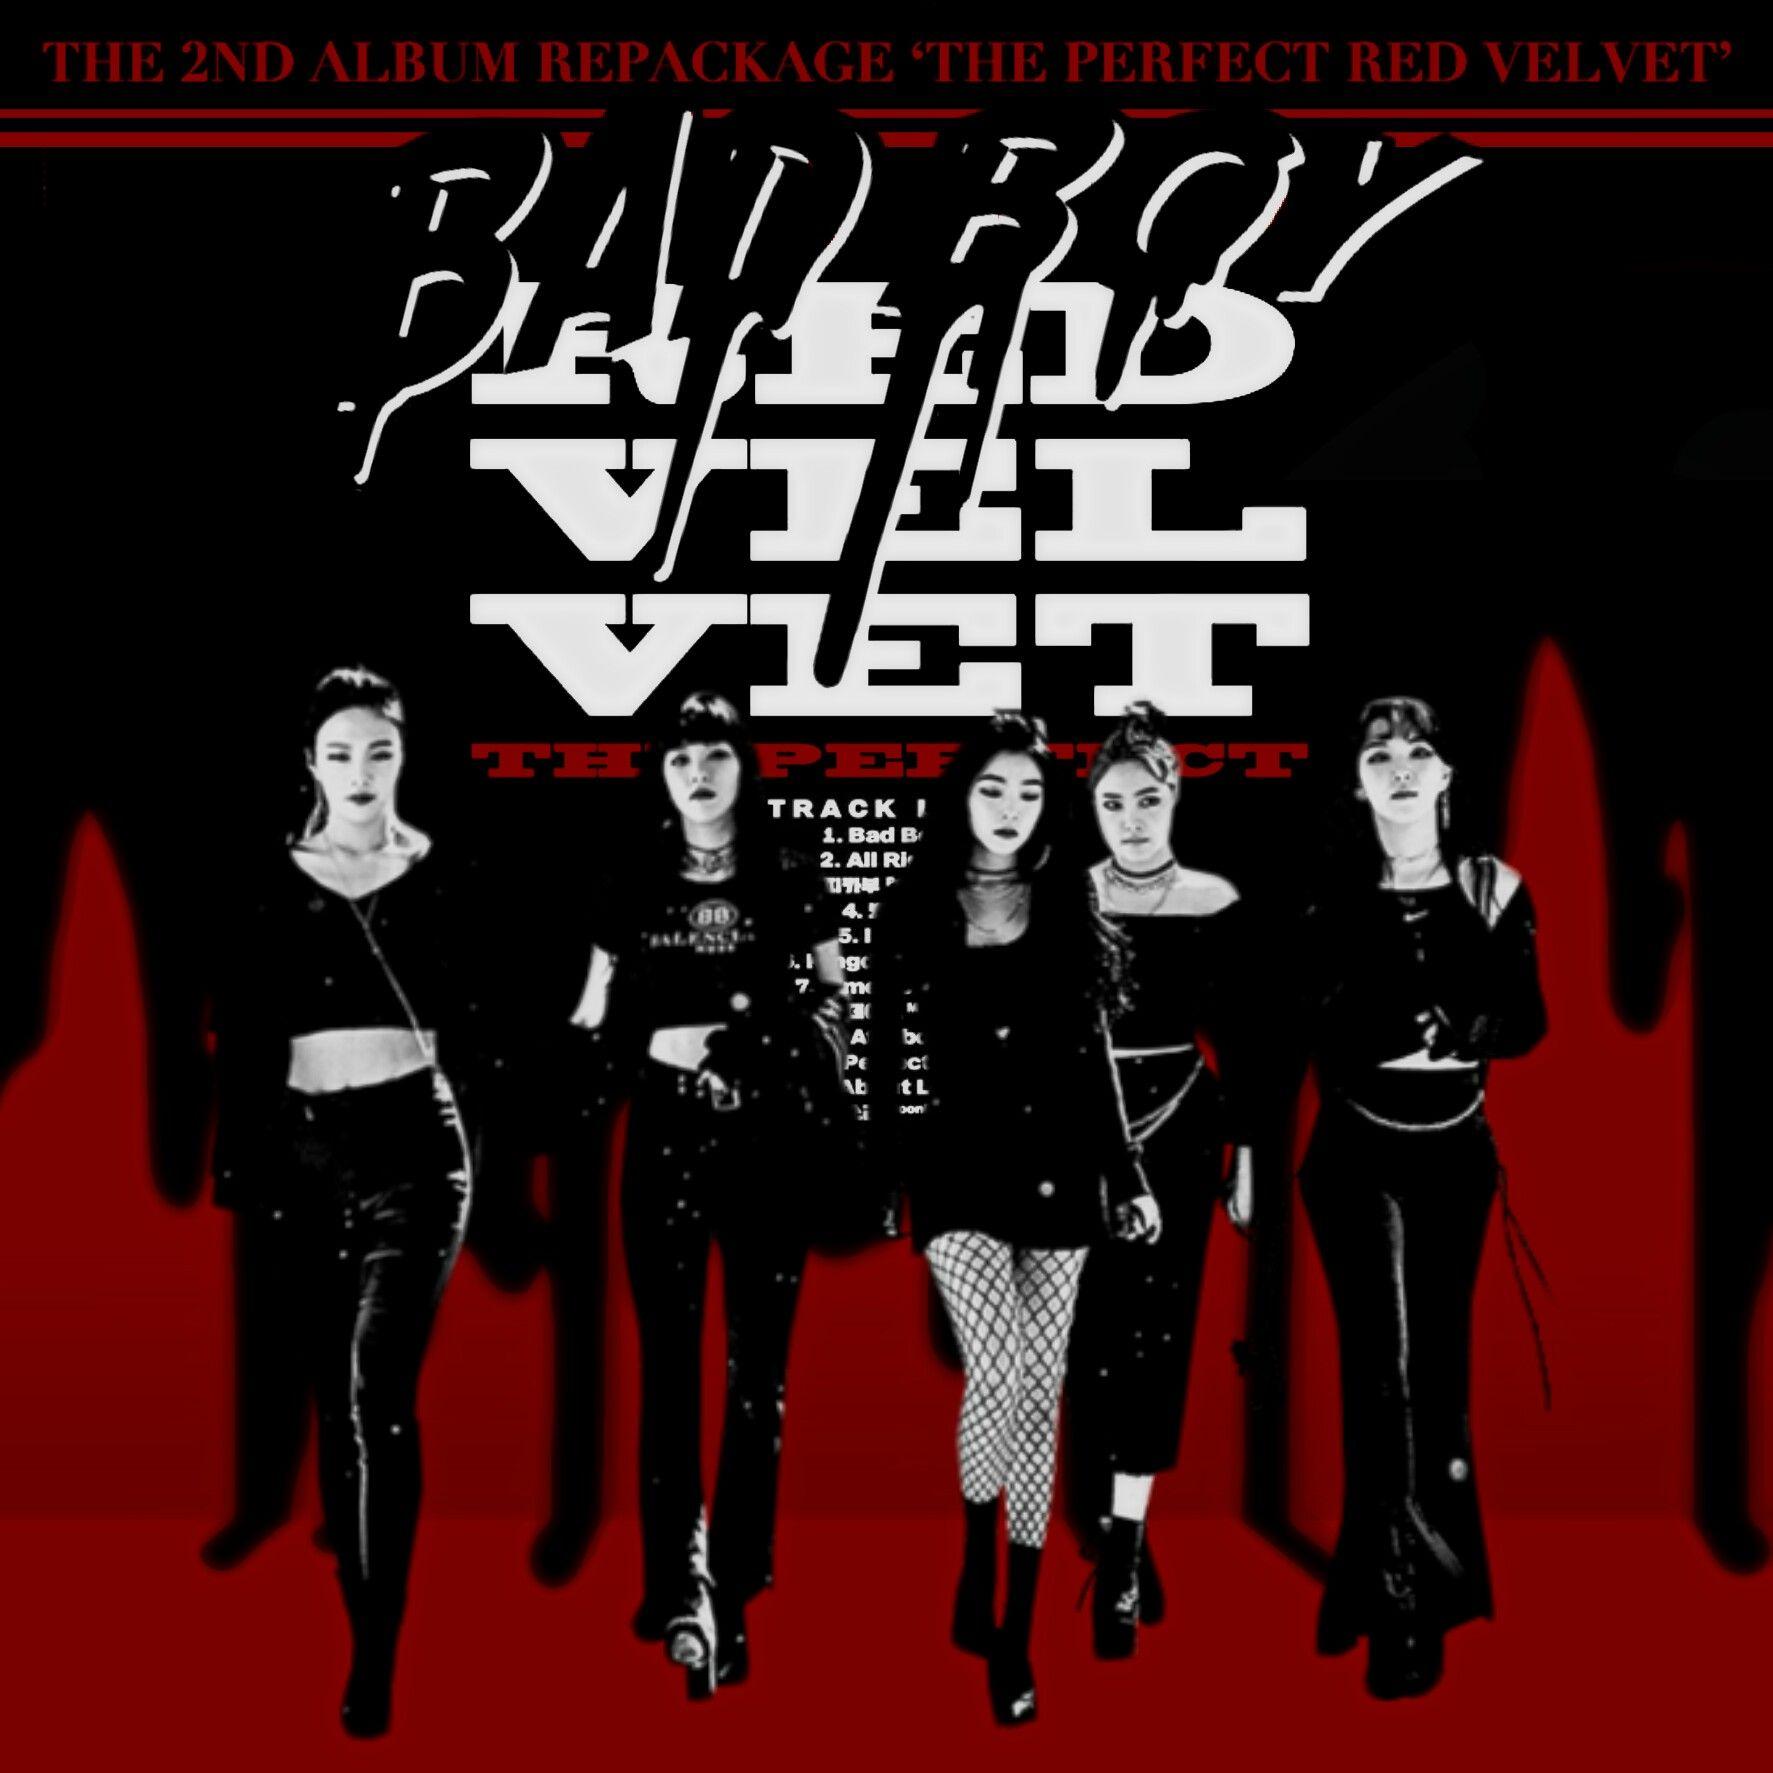 RED VELVET BAD BOY / THE PERFECT RED VELVET album by LEAlbum   album